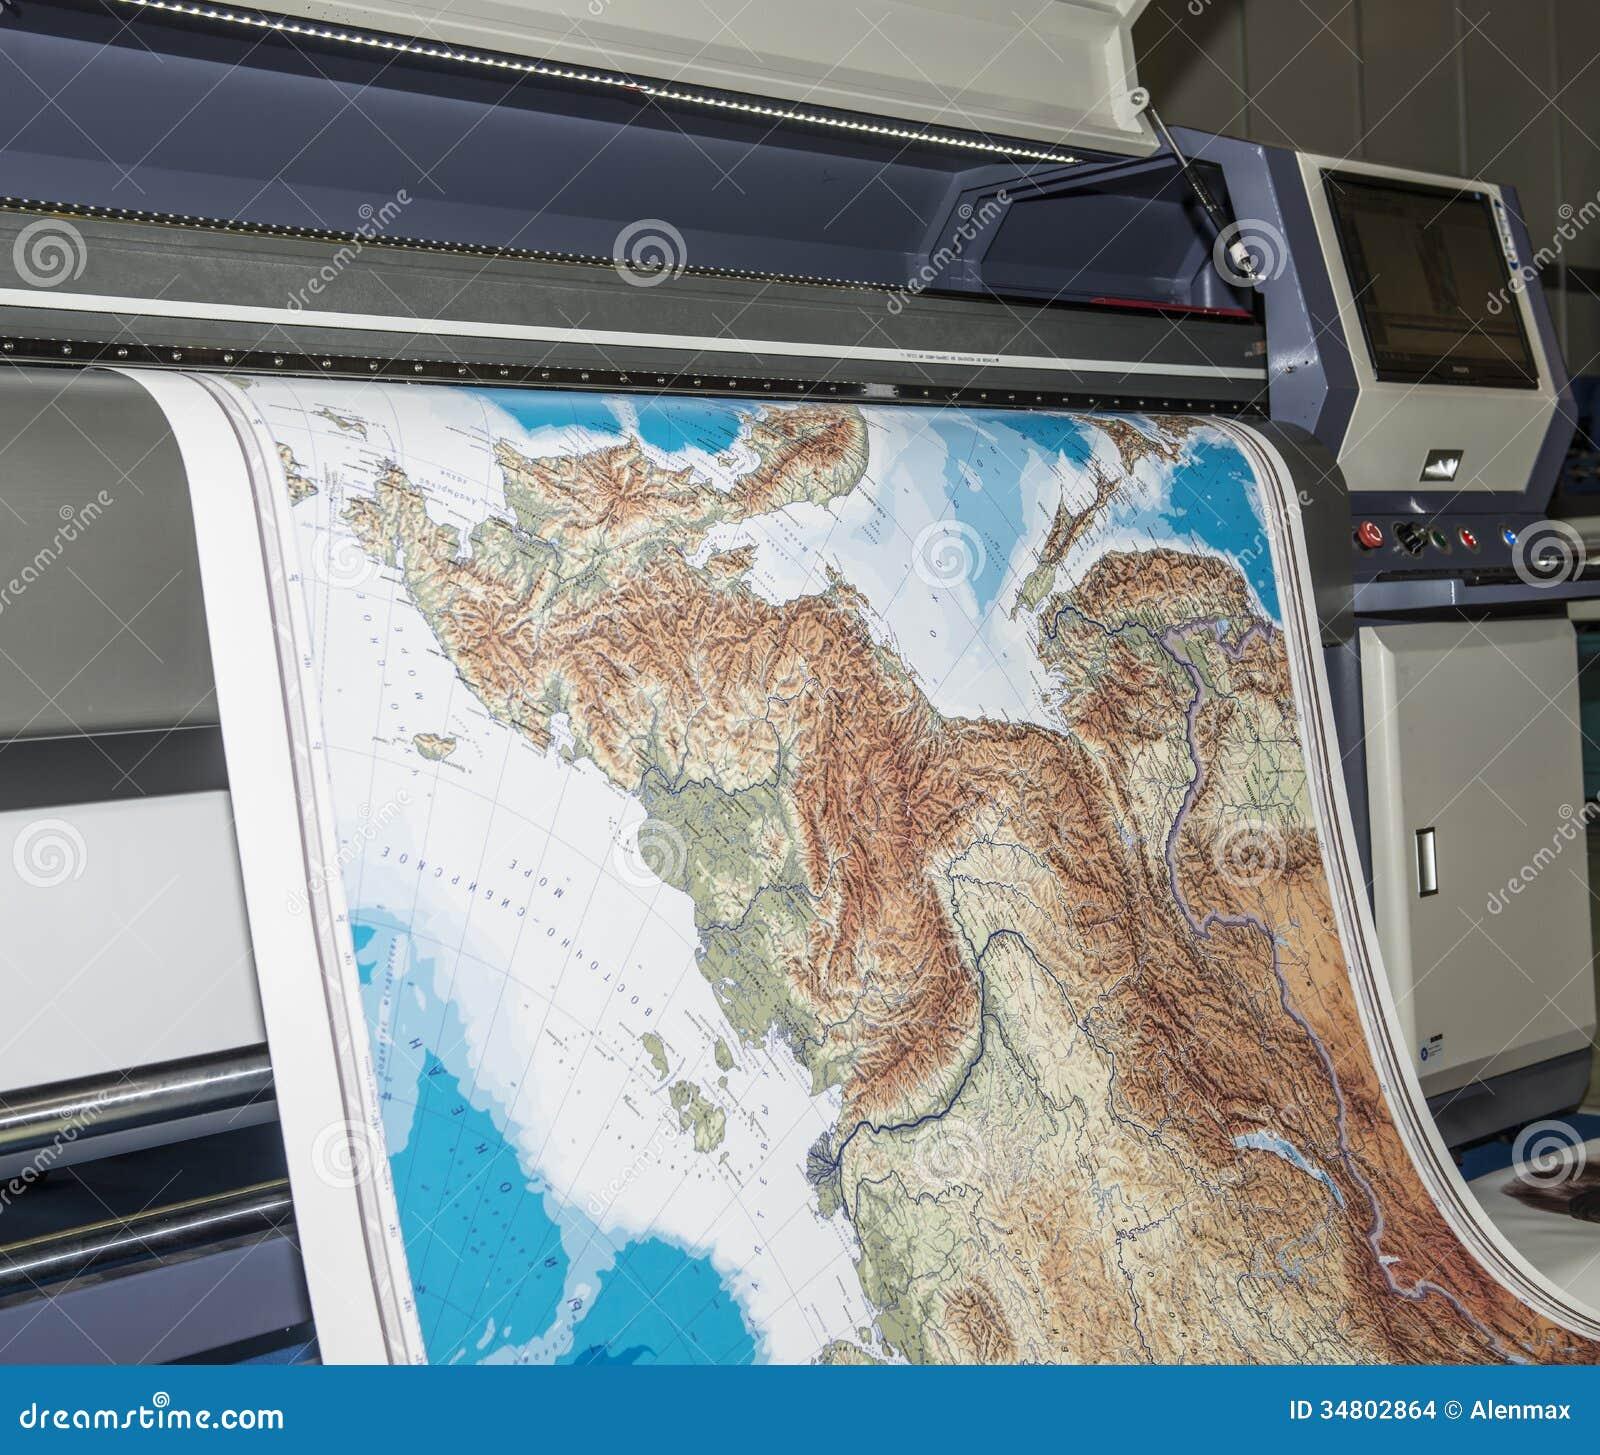 plotter printing map stock photo image of plotter format   - plotter printing map